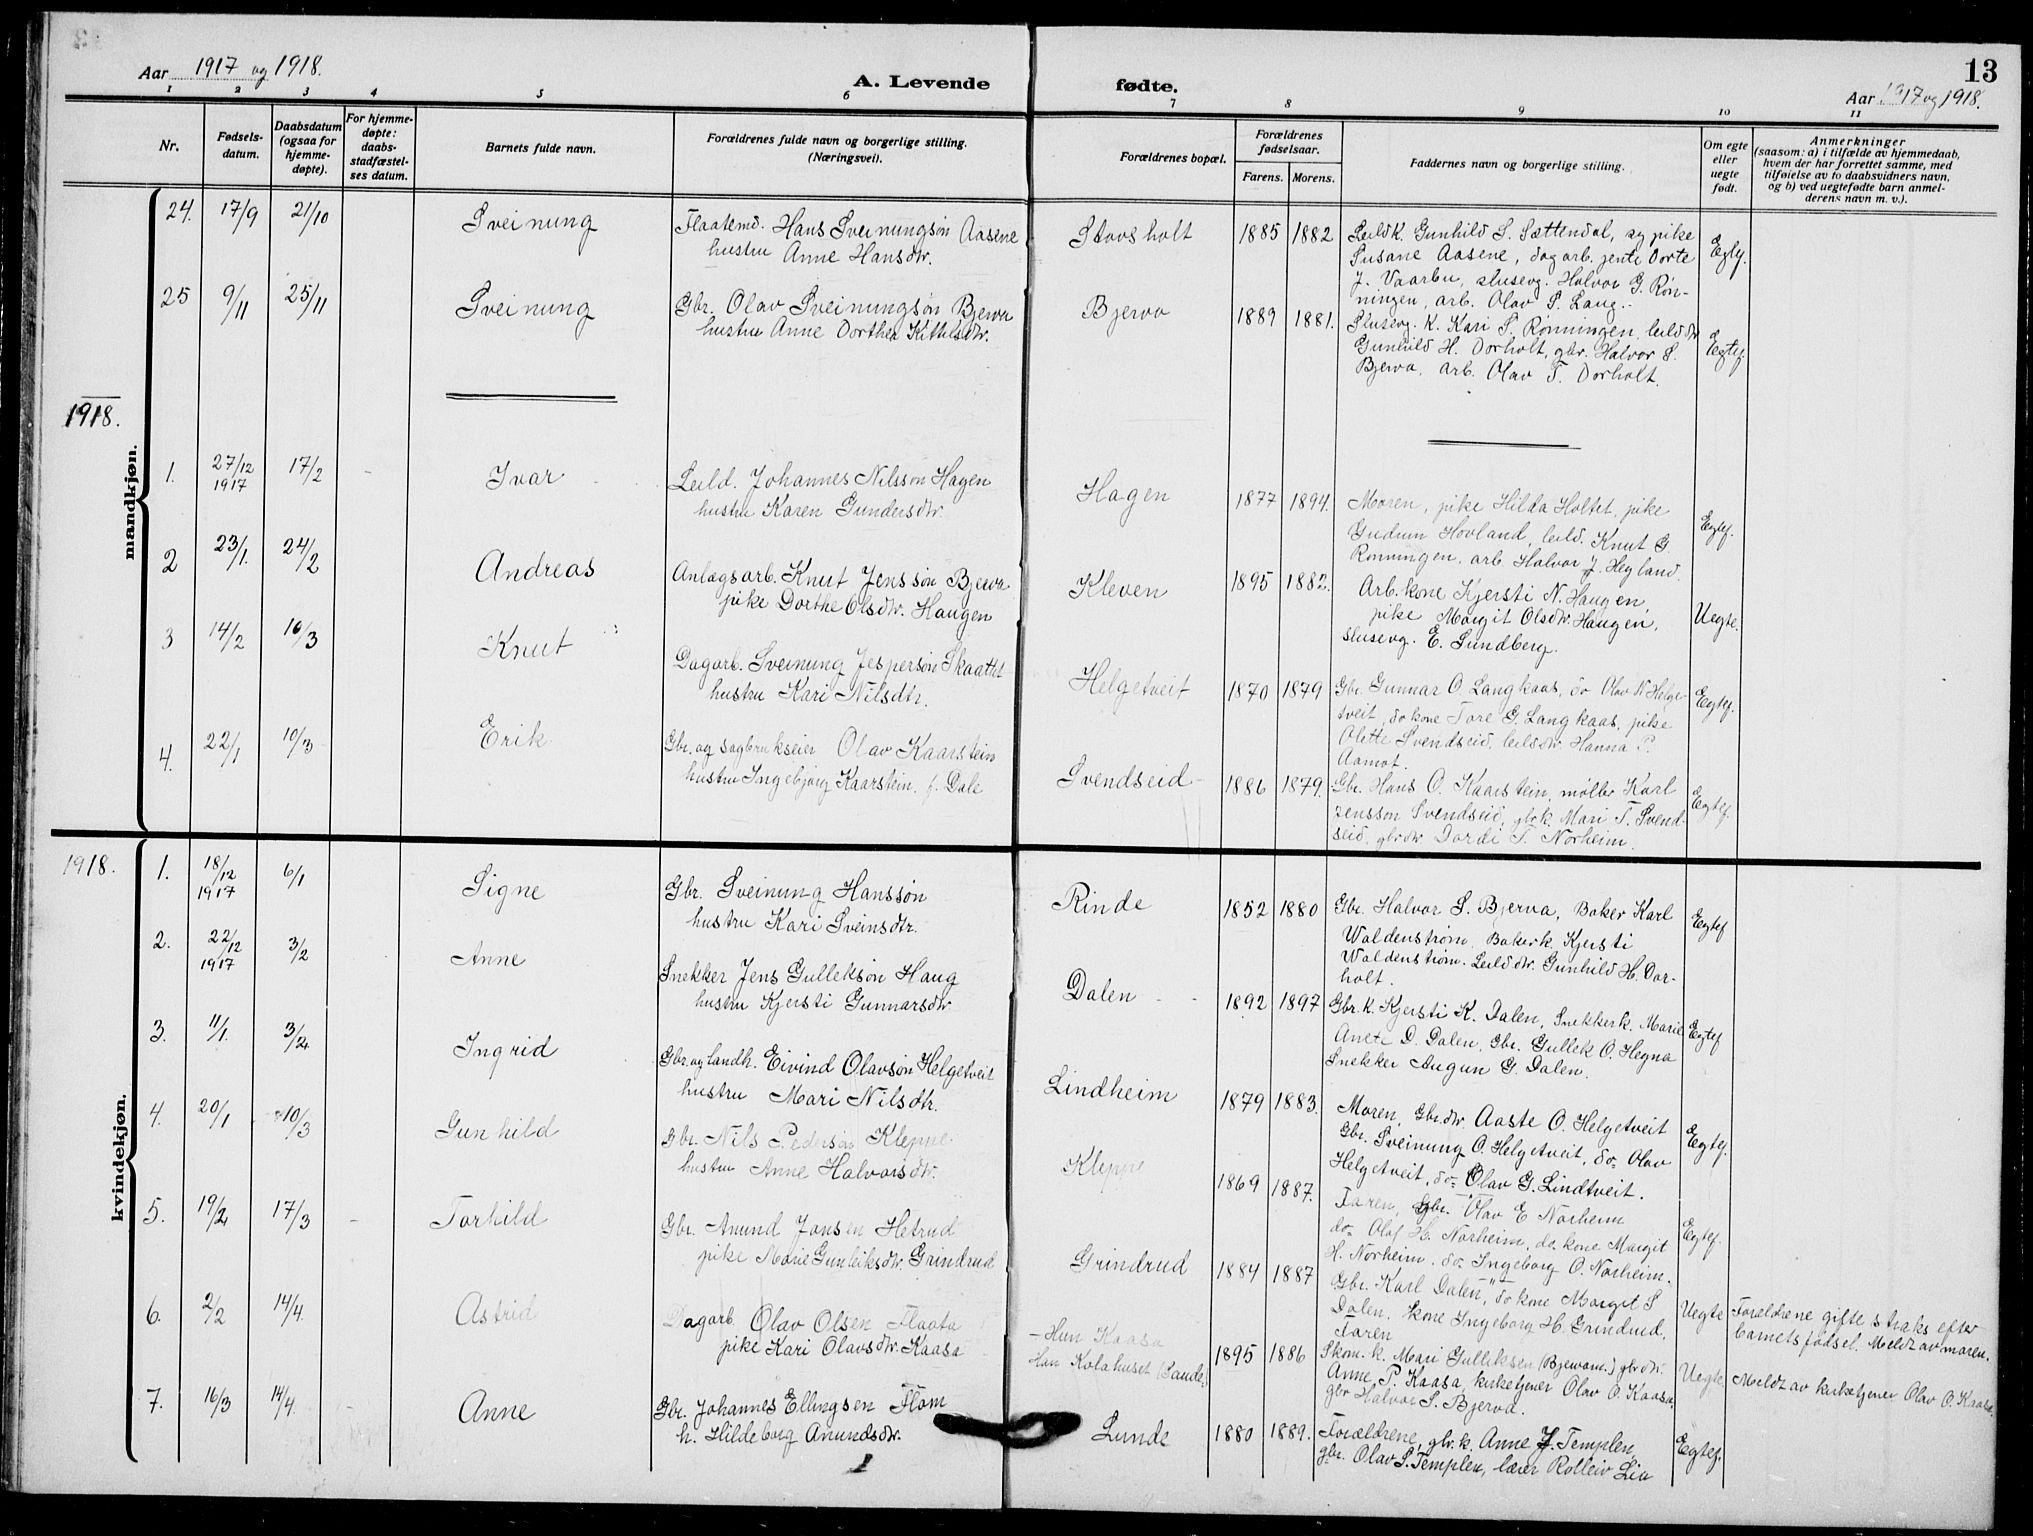 SAKO, Lunde kirkebøker, F/Fa/L0005: Ministerialbok nr. I 5, 1914-1922, s. 13